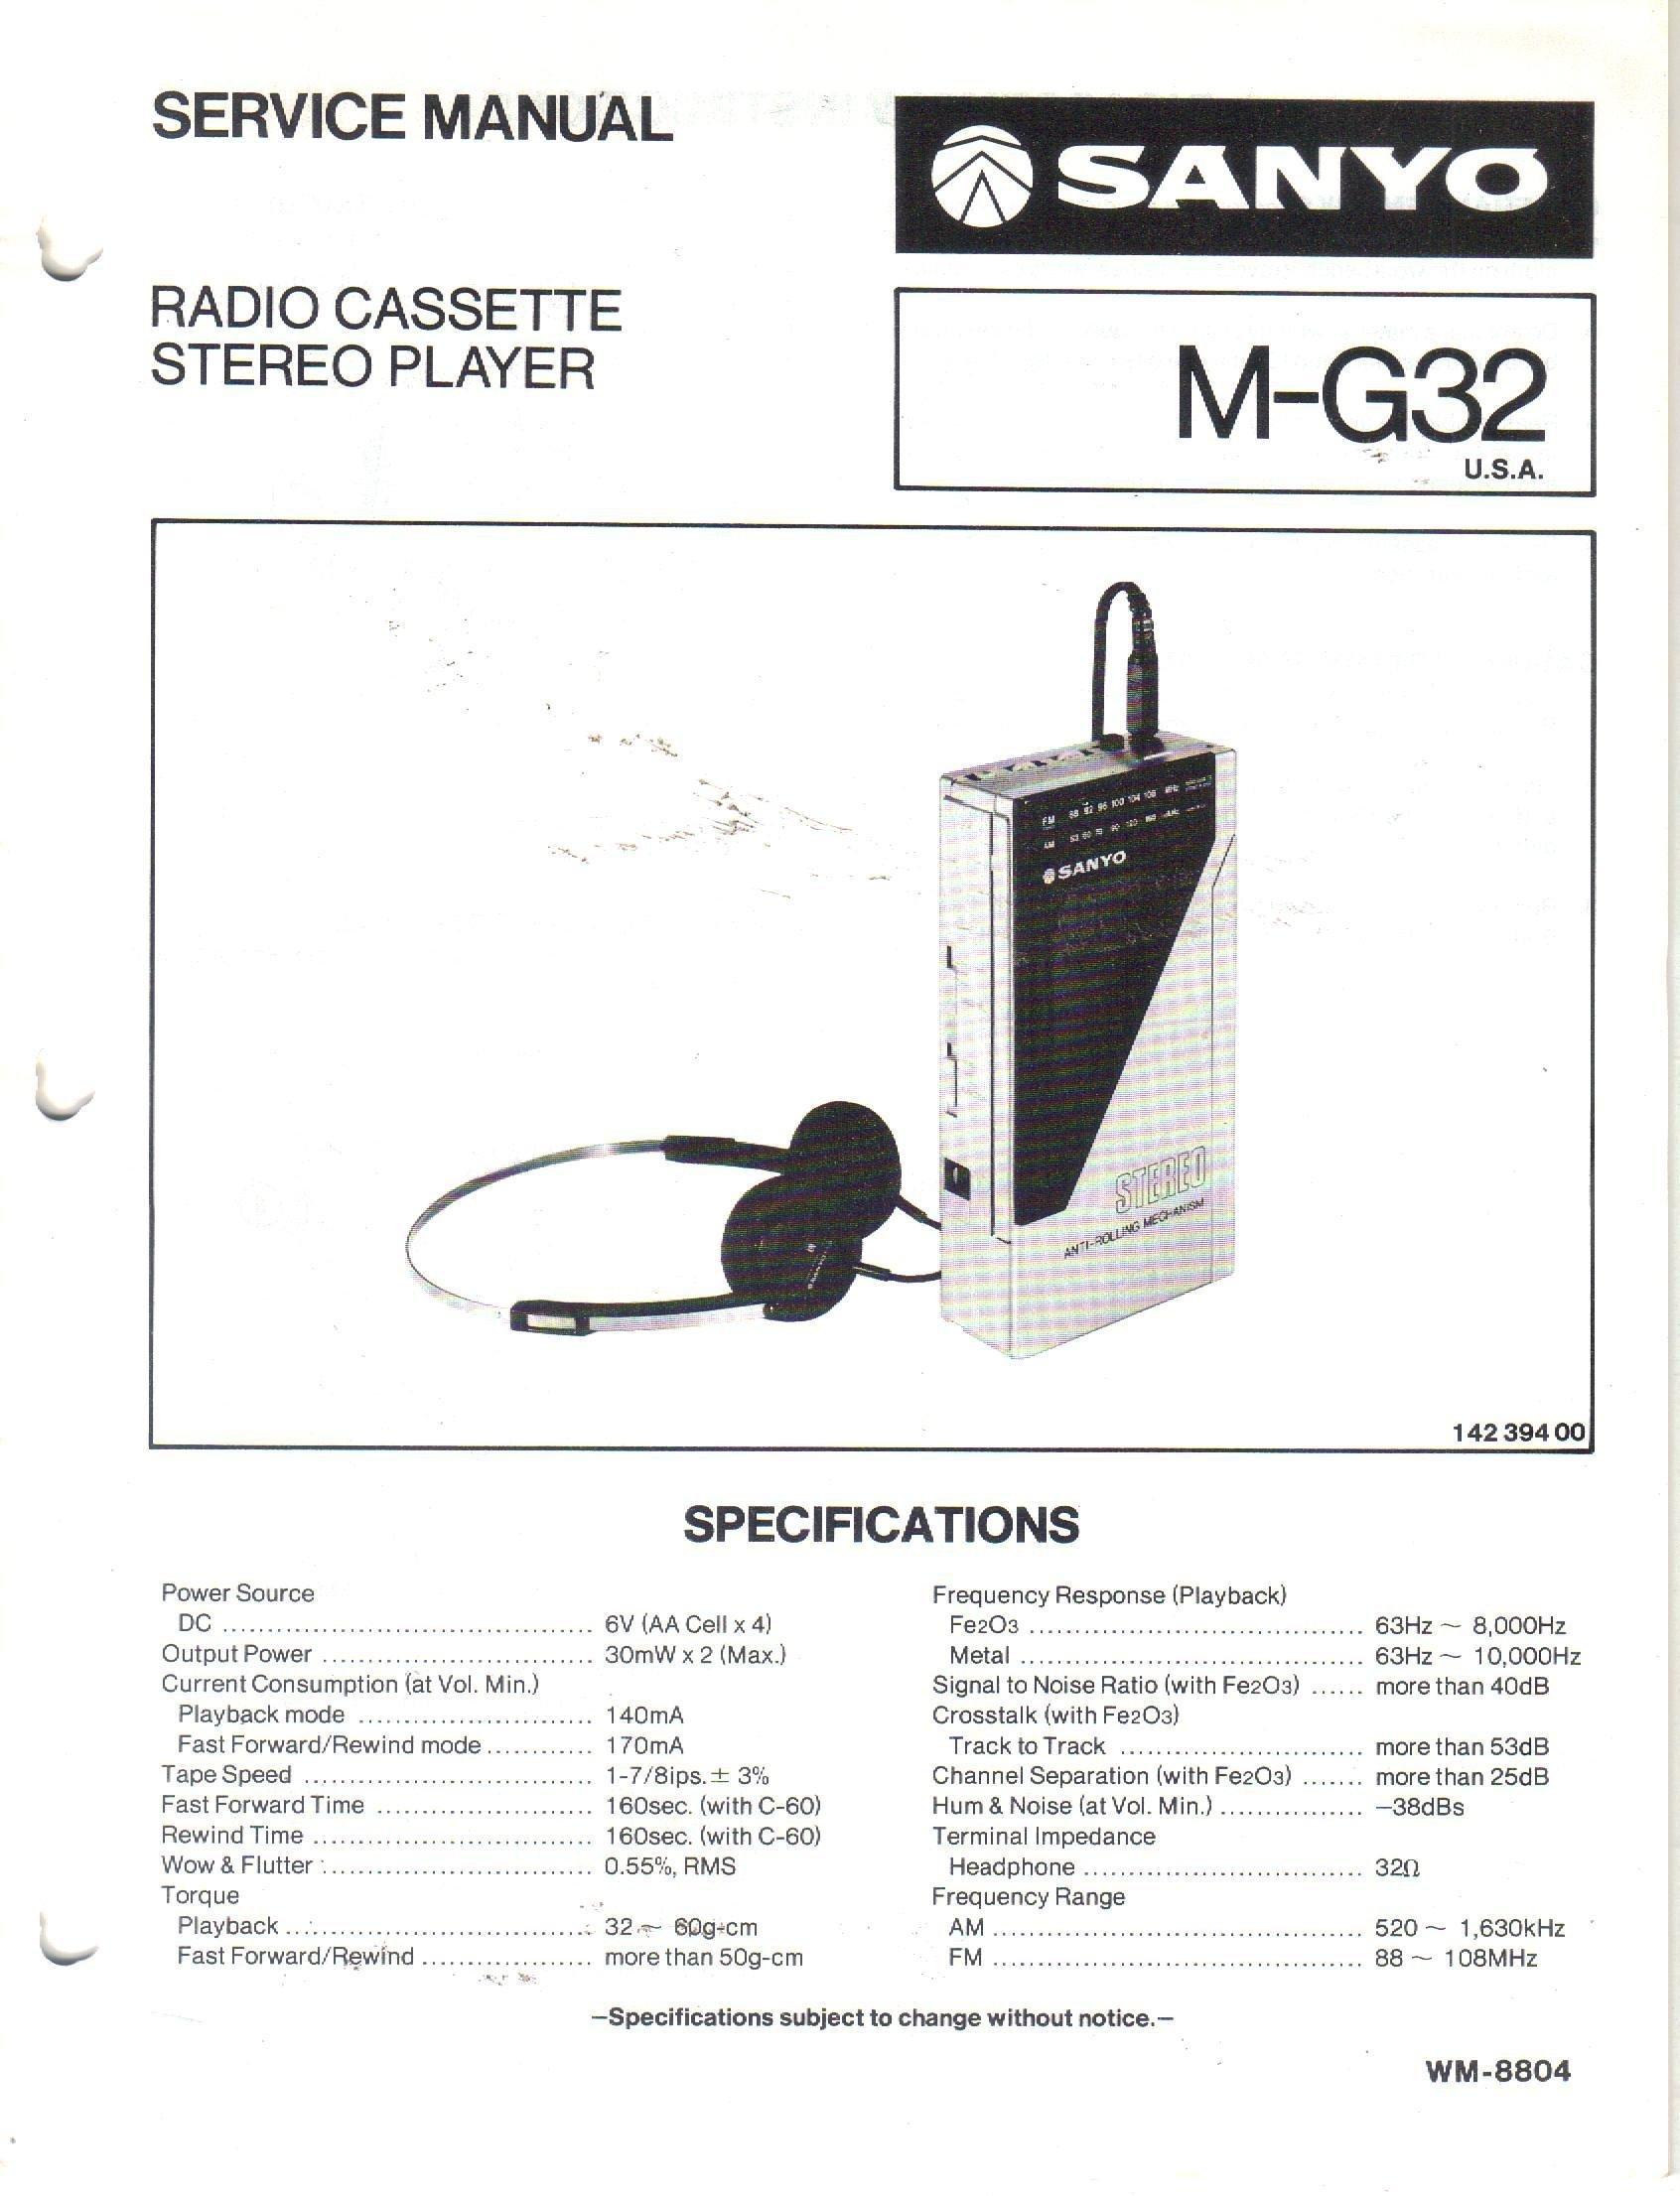 G32 Wiring Diagram Libraries 1999 Suzuki Esteem Belt Schematic Diagramssanyo M Radio Stereo Cassette Player Service Manual Sanyo Gmc Fuse